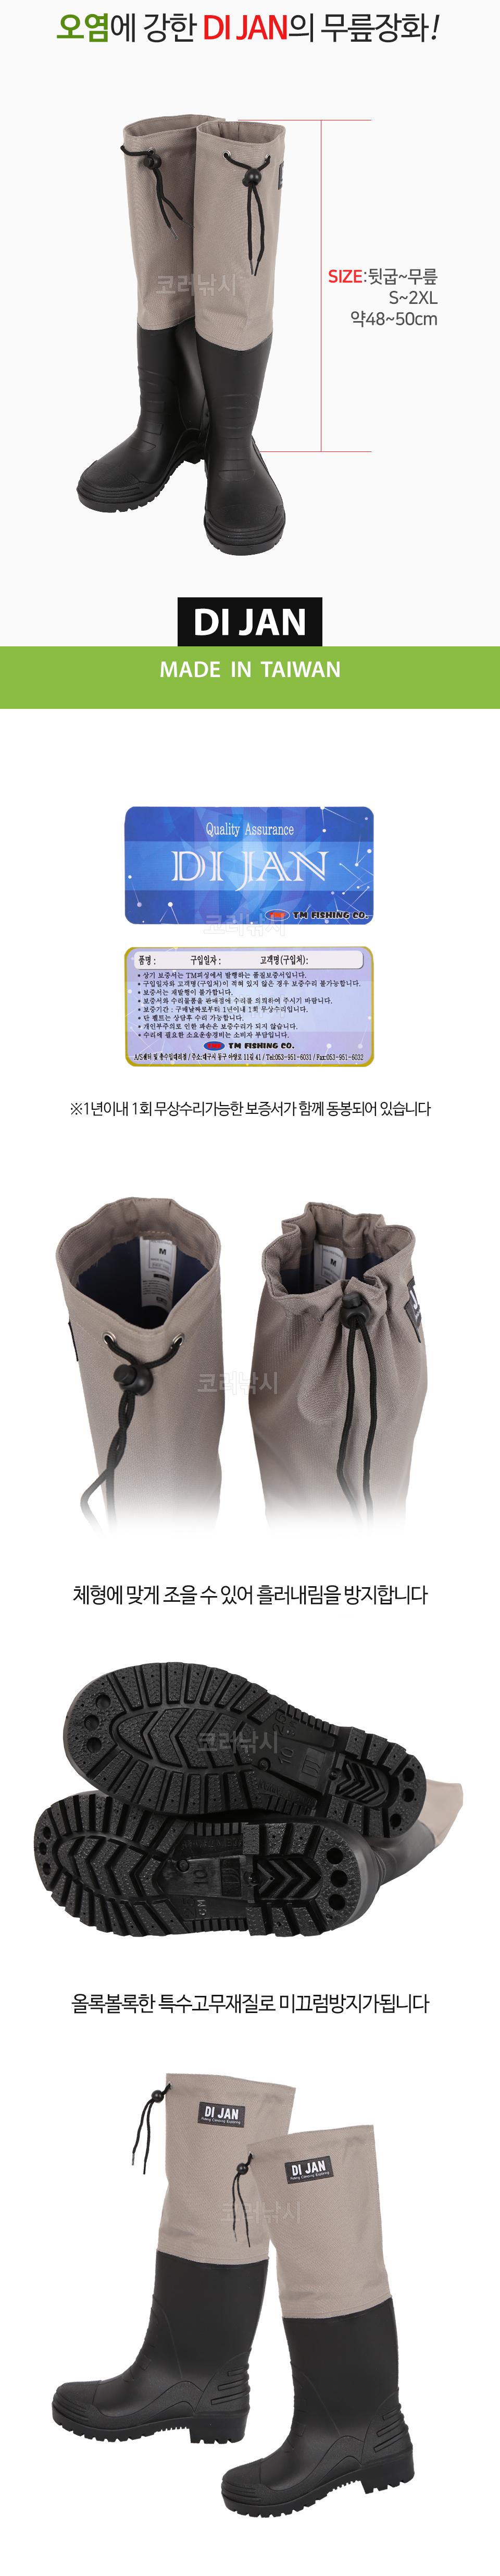 DI JAN 무릎 장화 TM101 (보증서 포함) 디잔 무릎장화 디잔무릎장화 감성장화